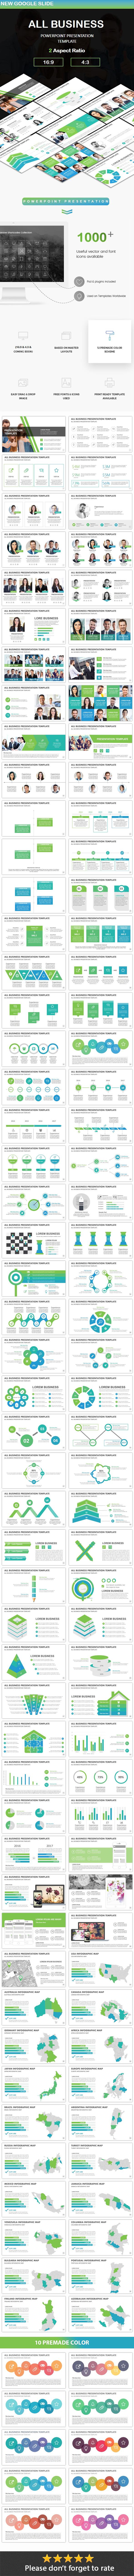 All Business Google Slide Powerpoint Template - Google Slides Presentation Templates